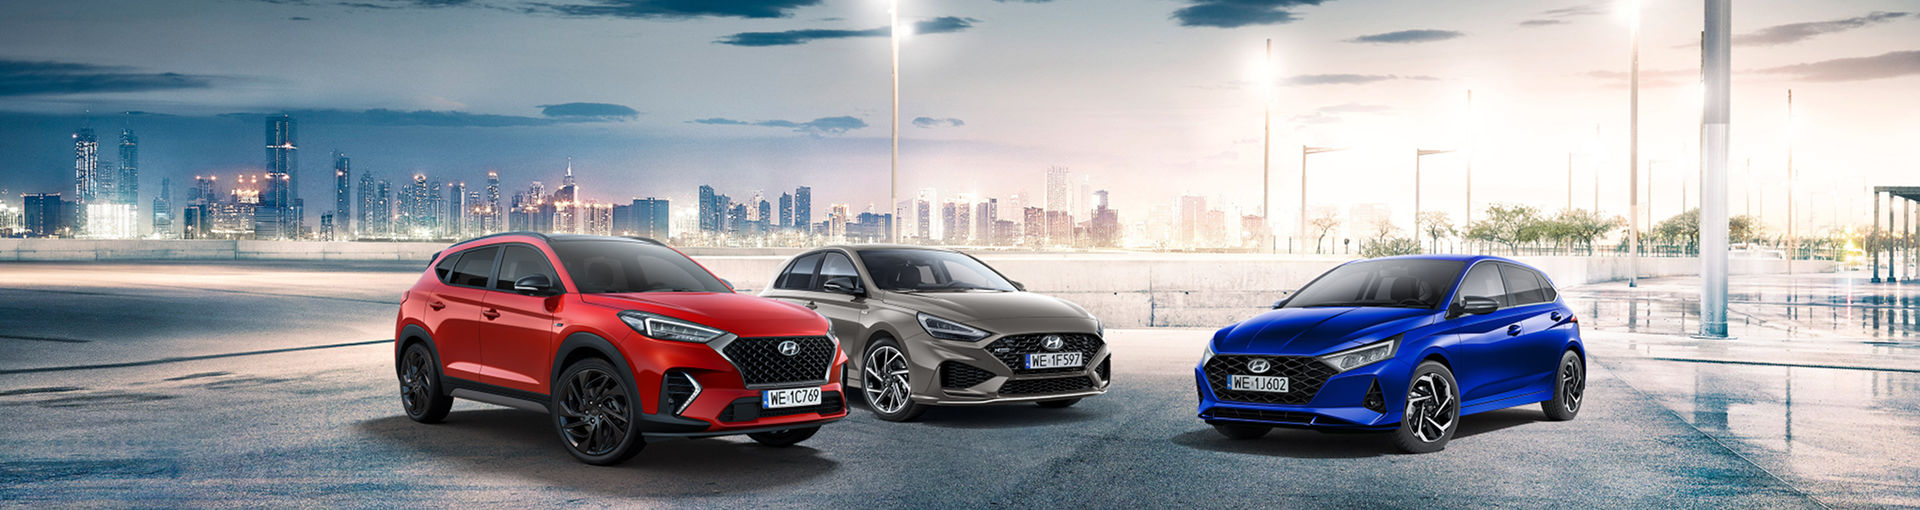 Promocje Hyundai